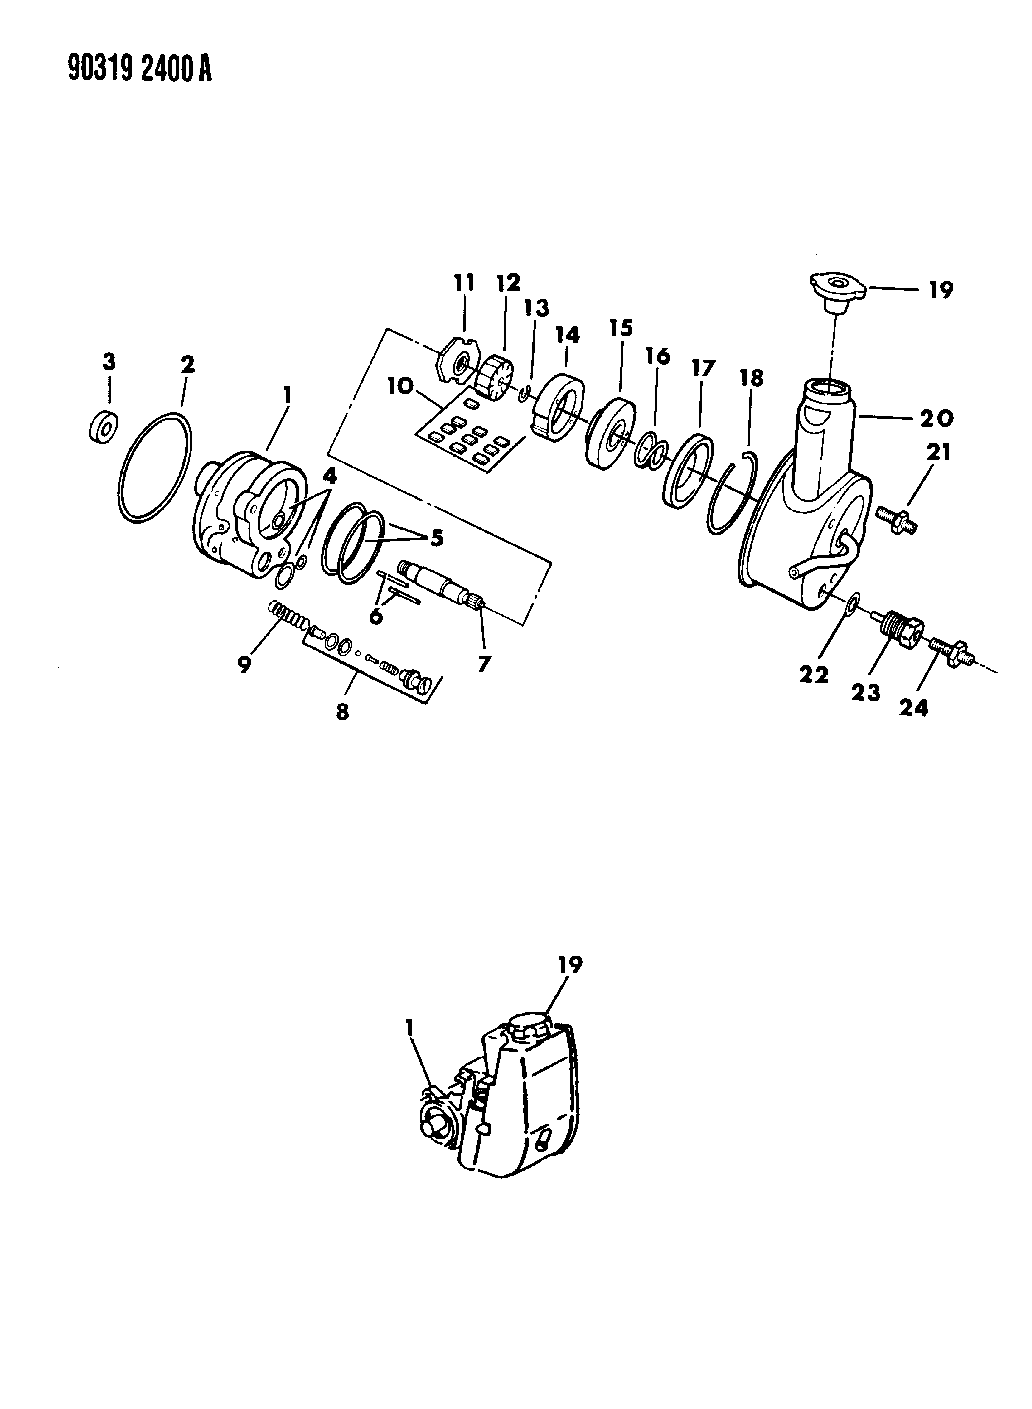 1991 Dodge Dakota Power Steering Pump & Attaching Parts